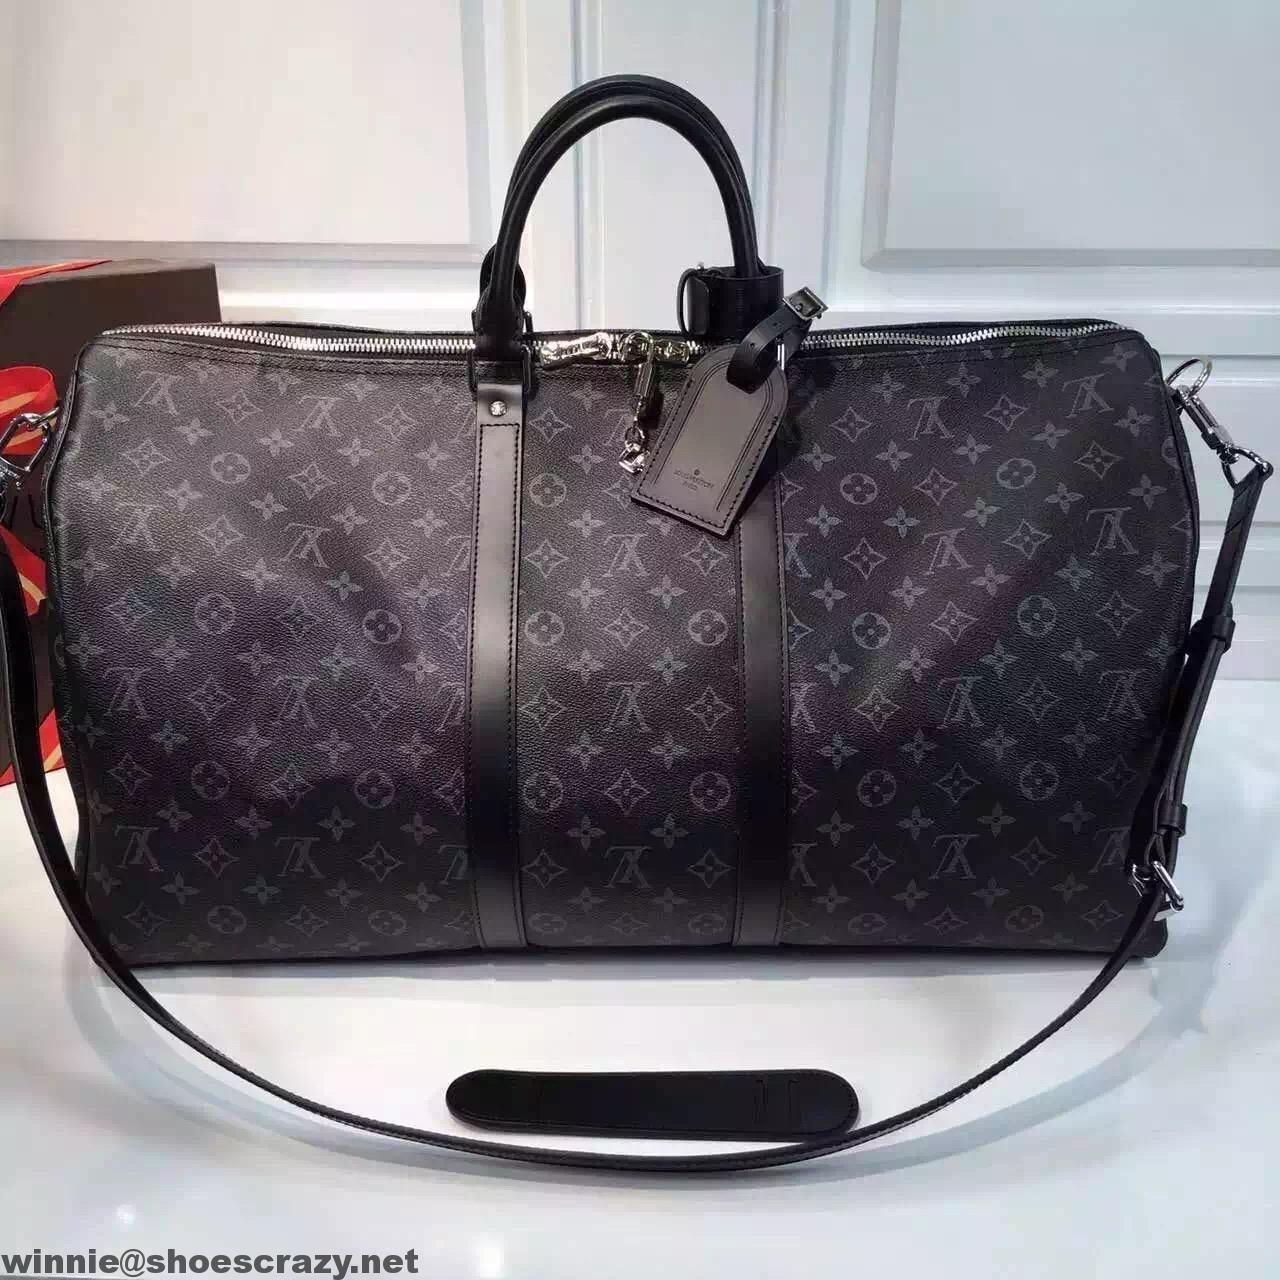 da4611892 Louis Vuitton Monogram Eclipse Keepall 55 Bandouliere Bag 2016 ...